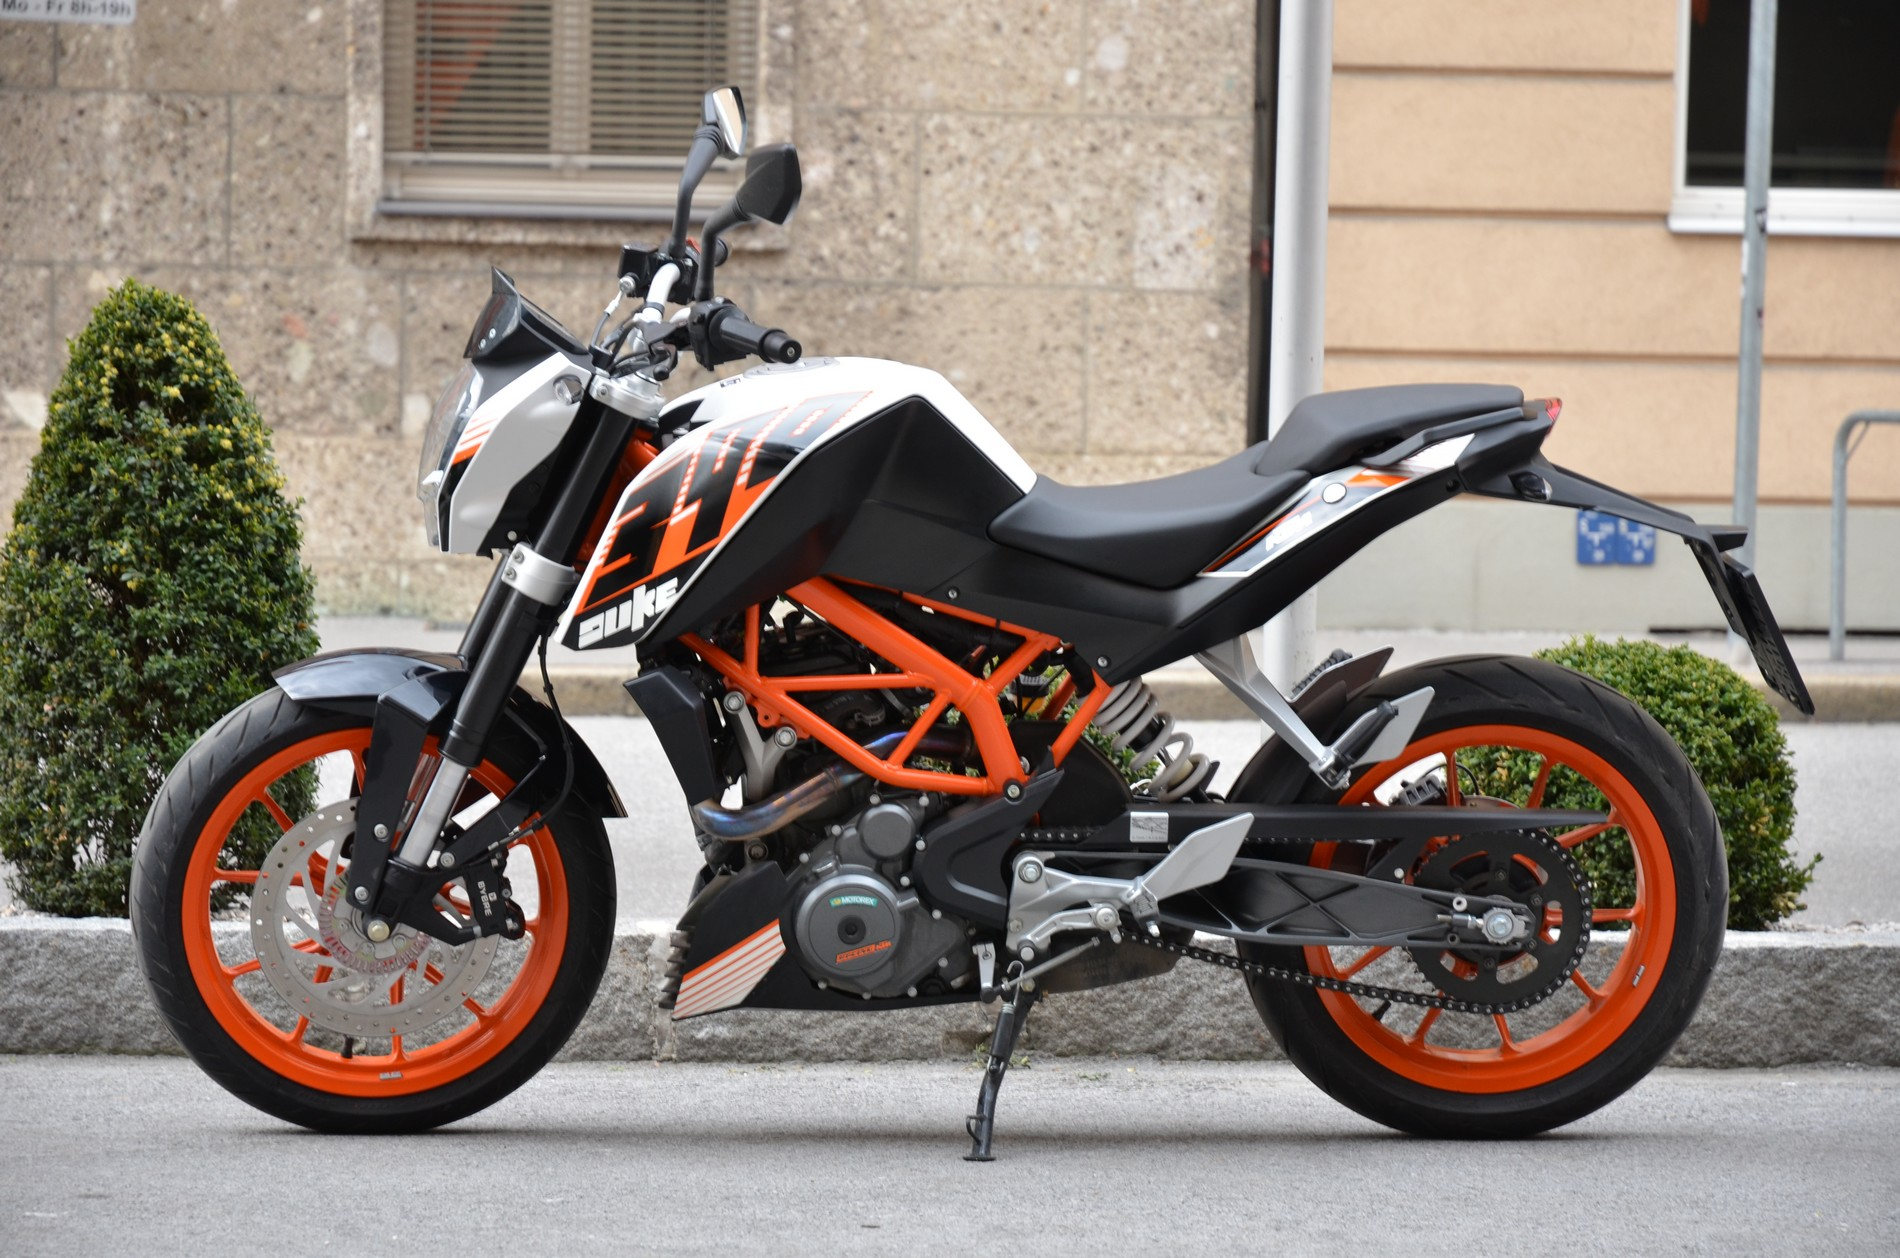 KTM Duke 390 – best import motorcycle